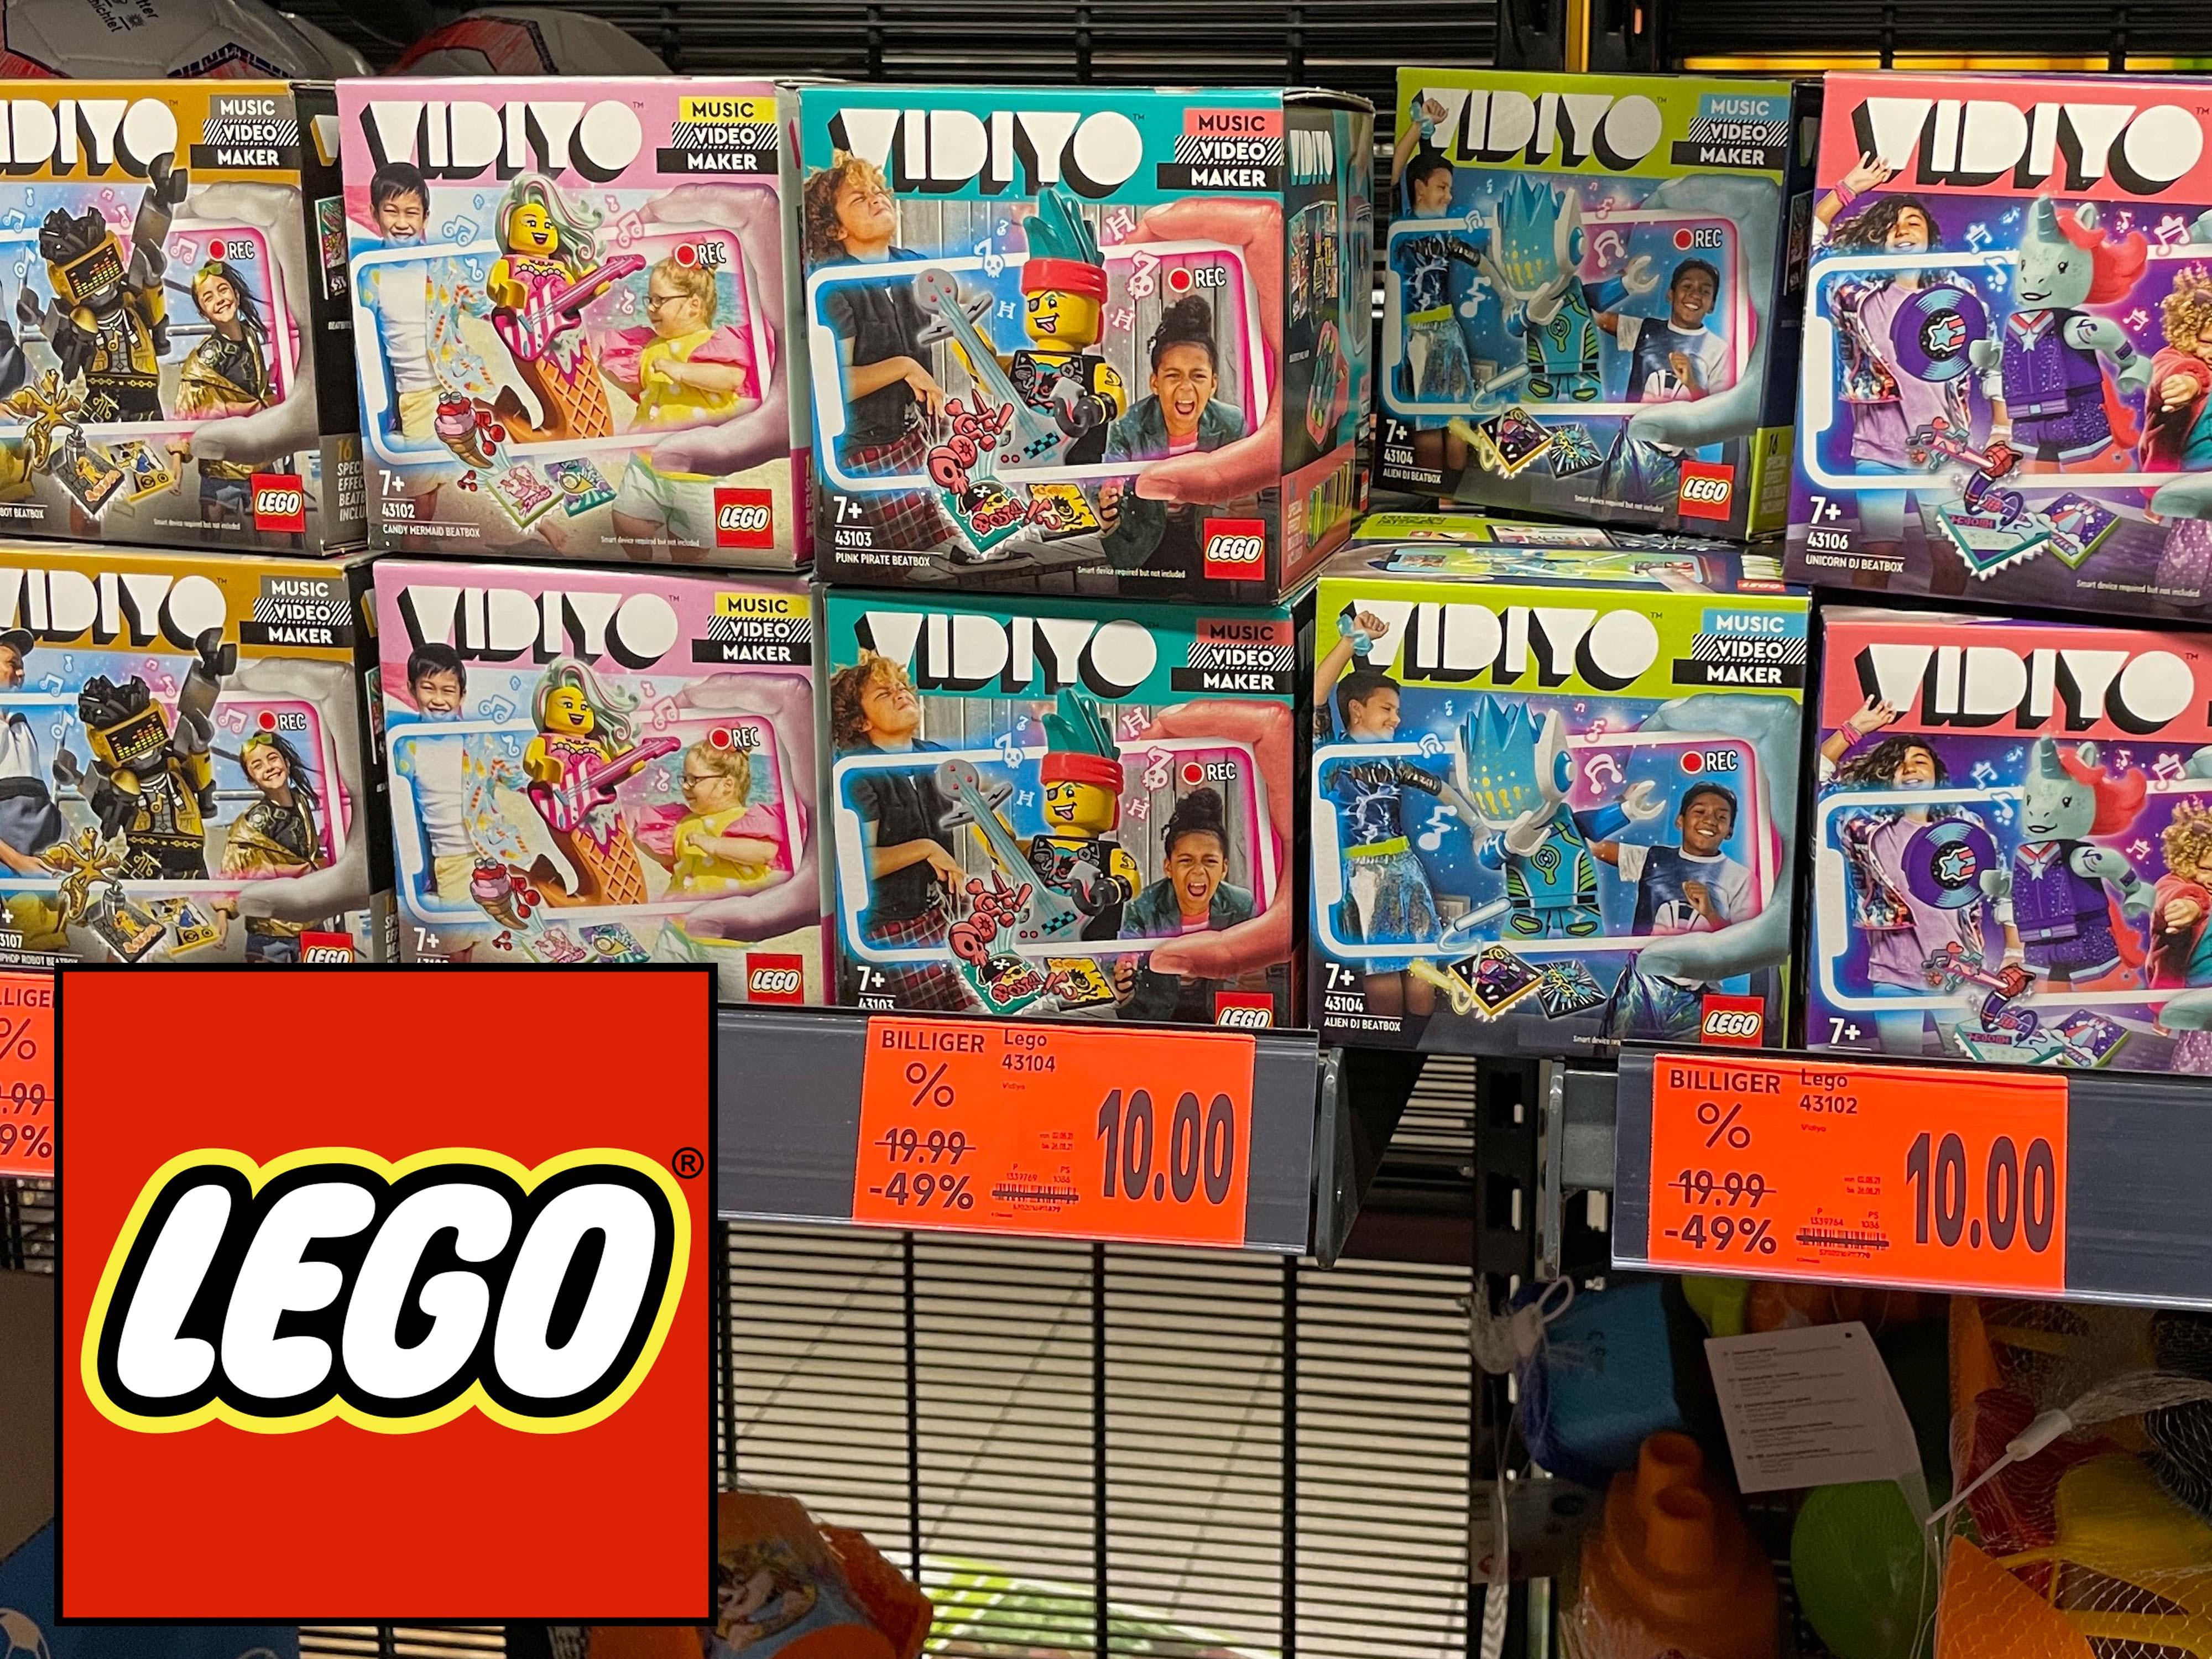 [Lokal Leipzig] Kaufland, LEGO VIDIYO BeatBox - 50% Rabatt (43102, 43104, 43105, 43107, 43103, 43106)